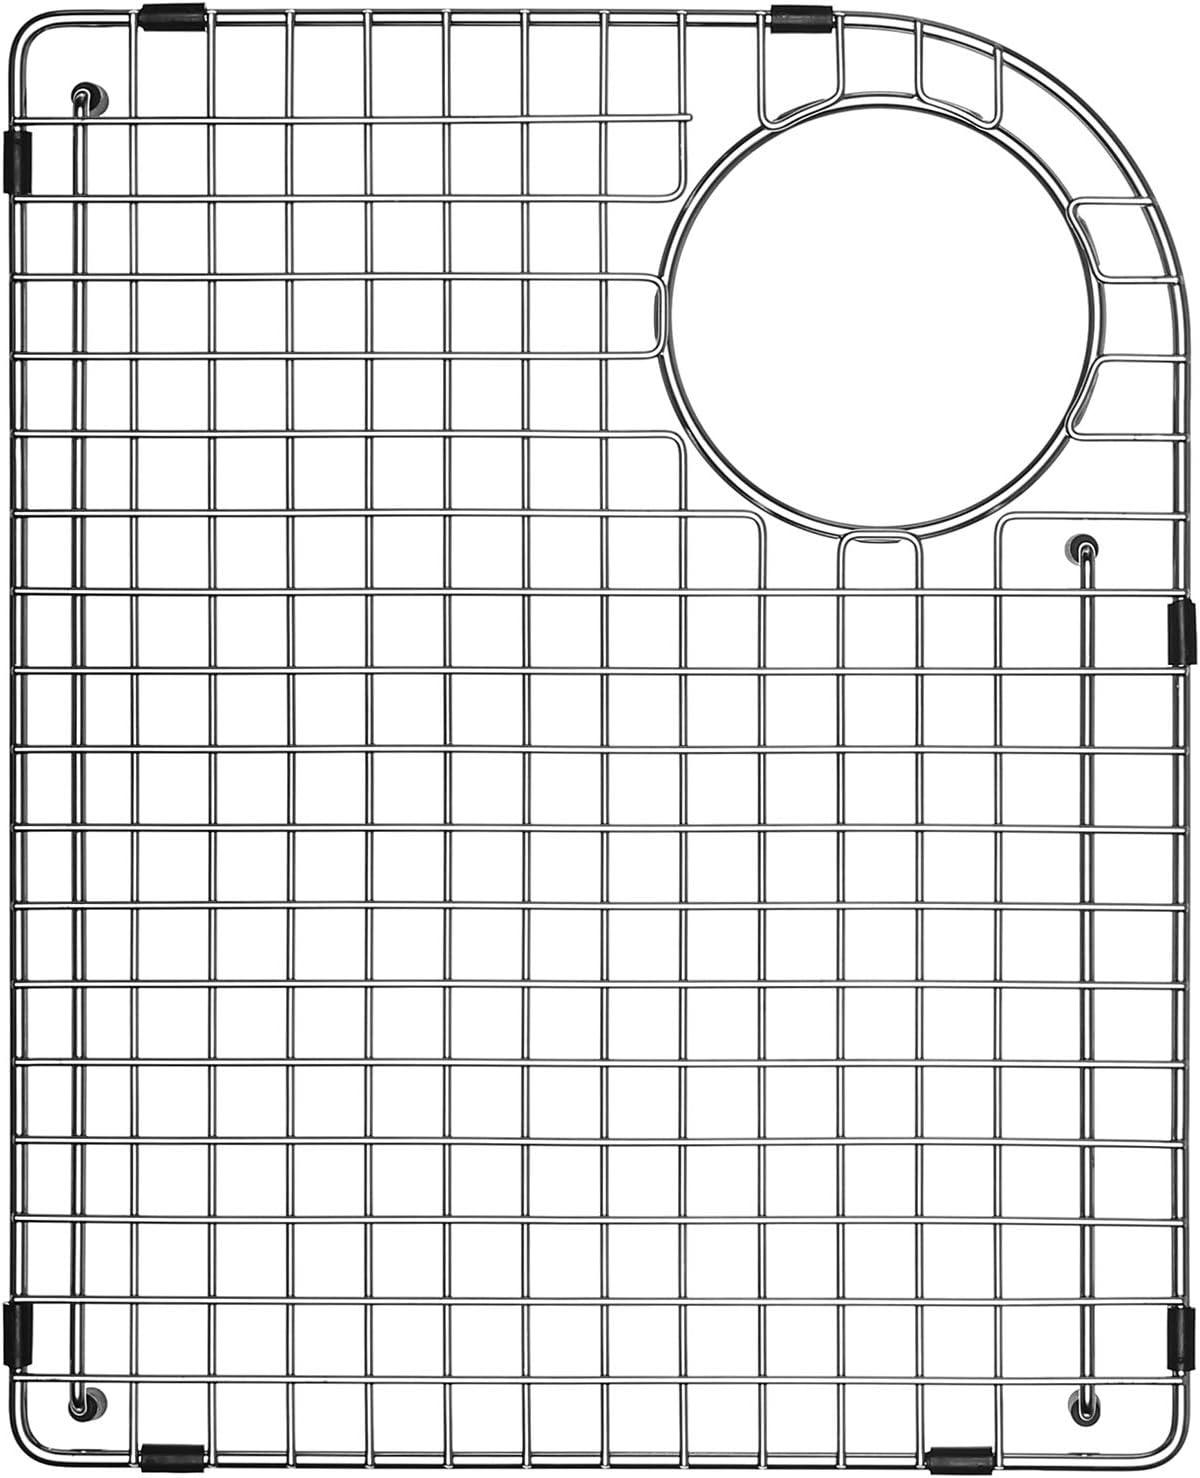 Serene Valley Sink Bottom Grid 14 1 4 X 17 5 8 Rear Corner Drain With Radius 3 3 4 Sink Grid Stainless Steel Ndg1417lr Amazon Com